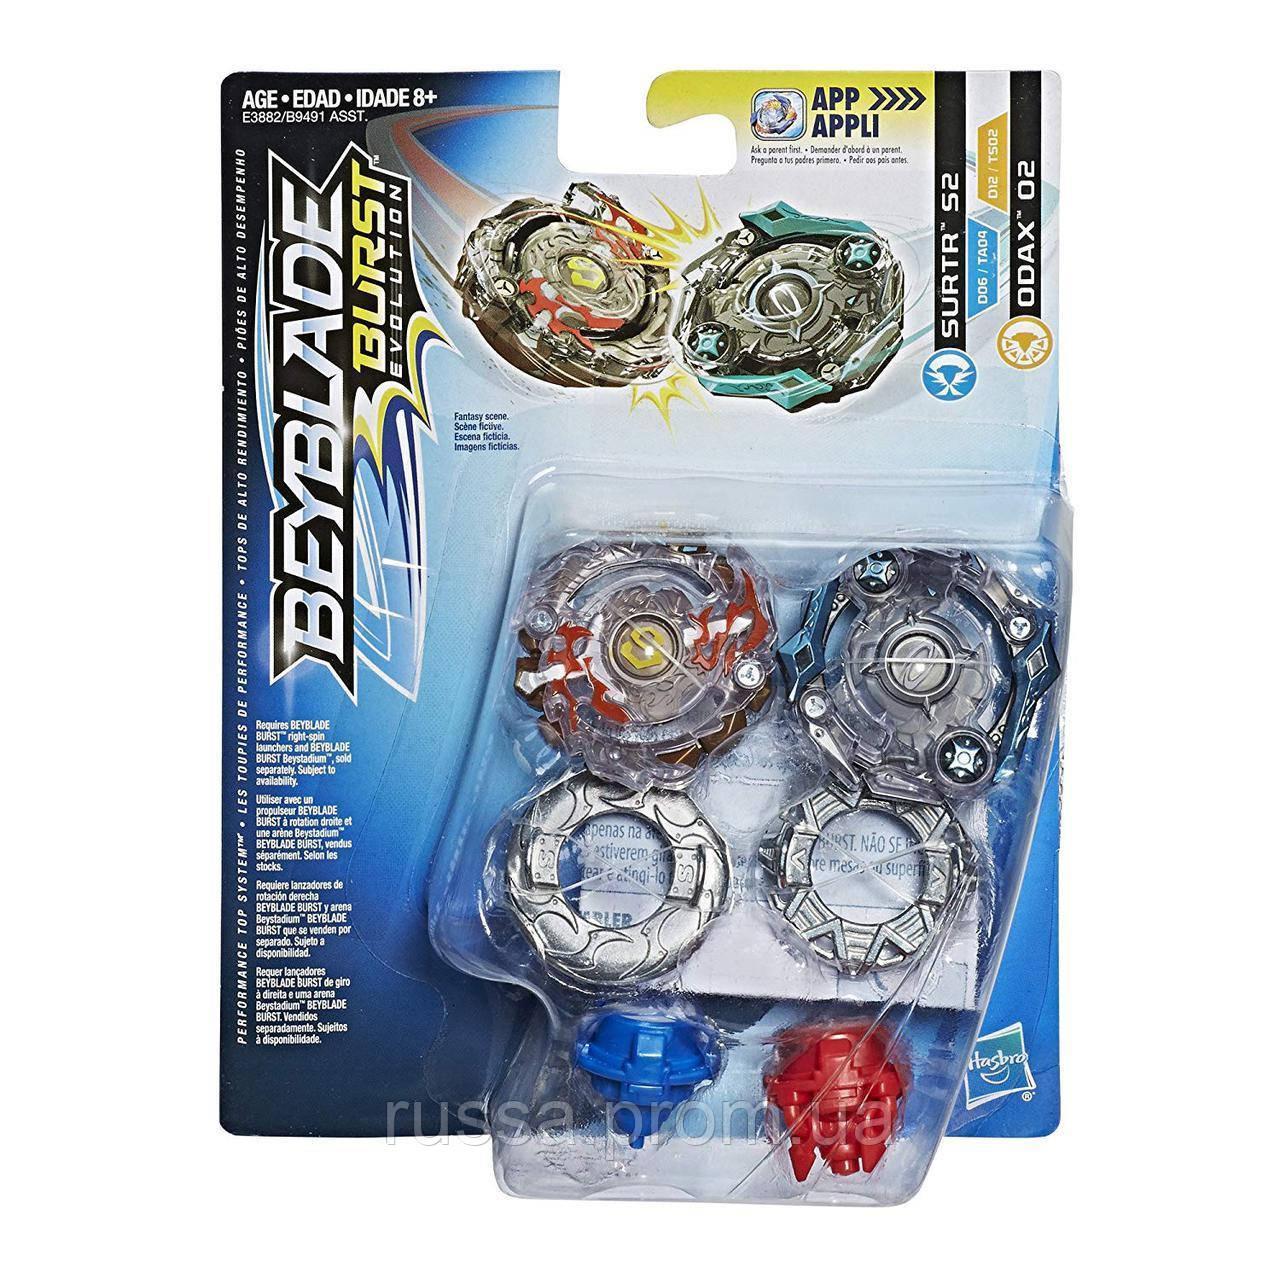 Набор Бейблейдов Сартр С2 и Одакс О2 Beyblade Burst Evolution Dual Pack Surtr S2 and Odax O2 Hasbro Суртр